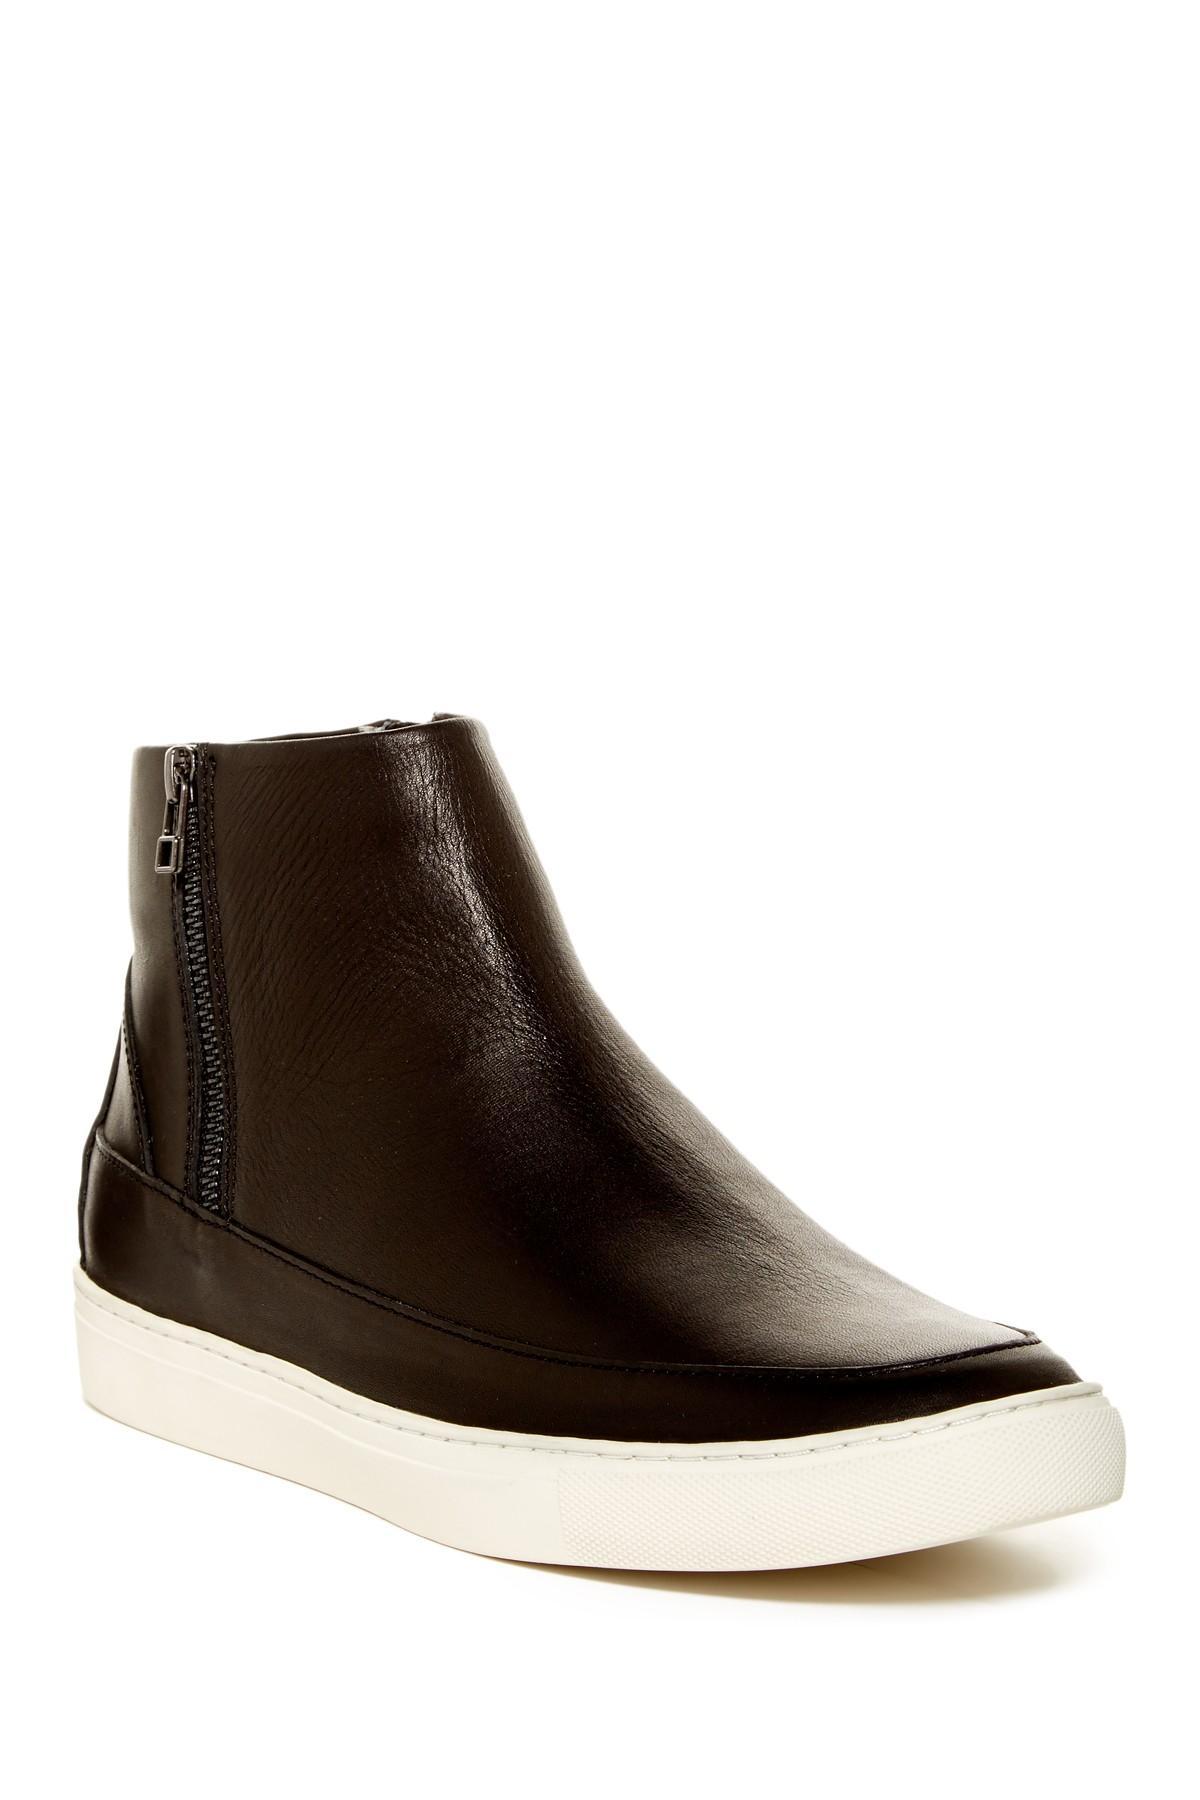 Lyst Tcg Sinclair Chelsea Sneaker In Black For Men